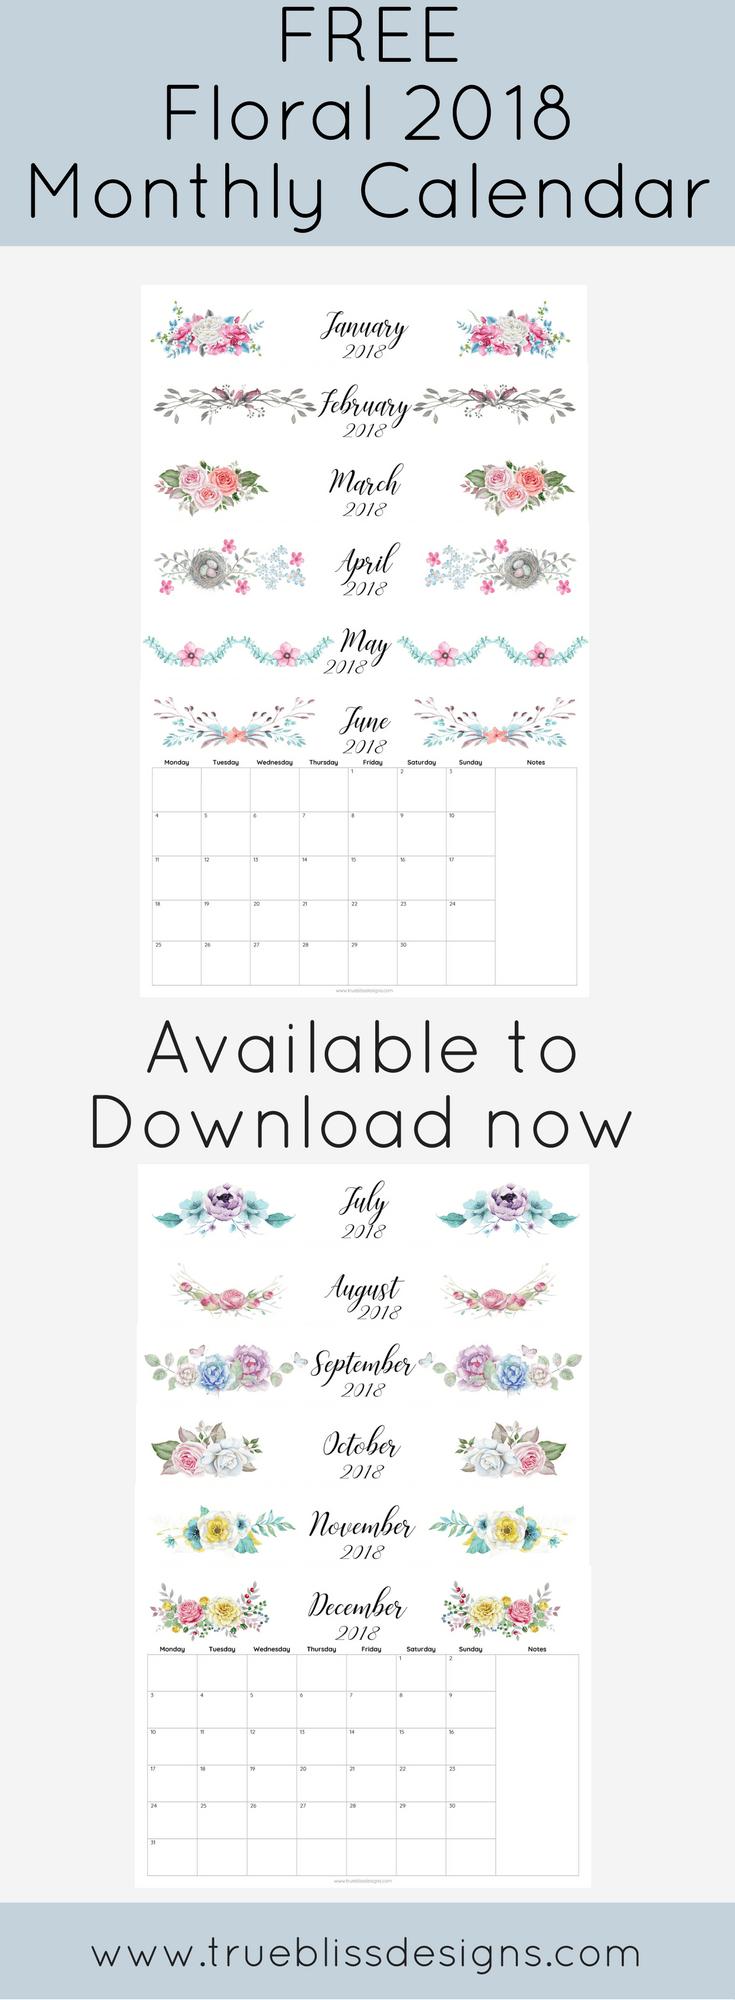 Free 2018 Calendar Printable For Download The Suburban Mom